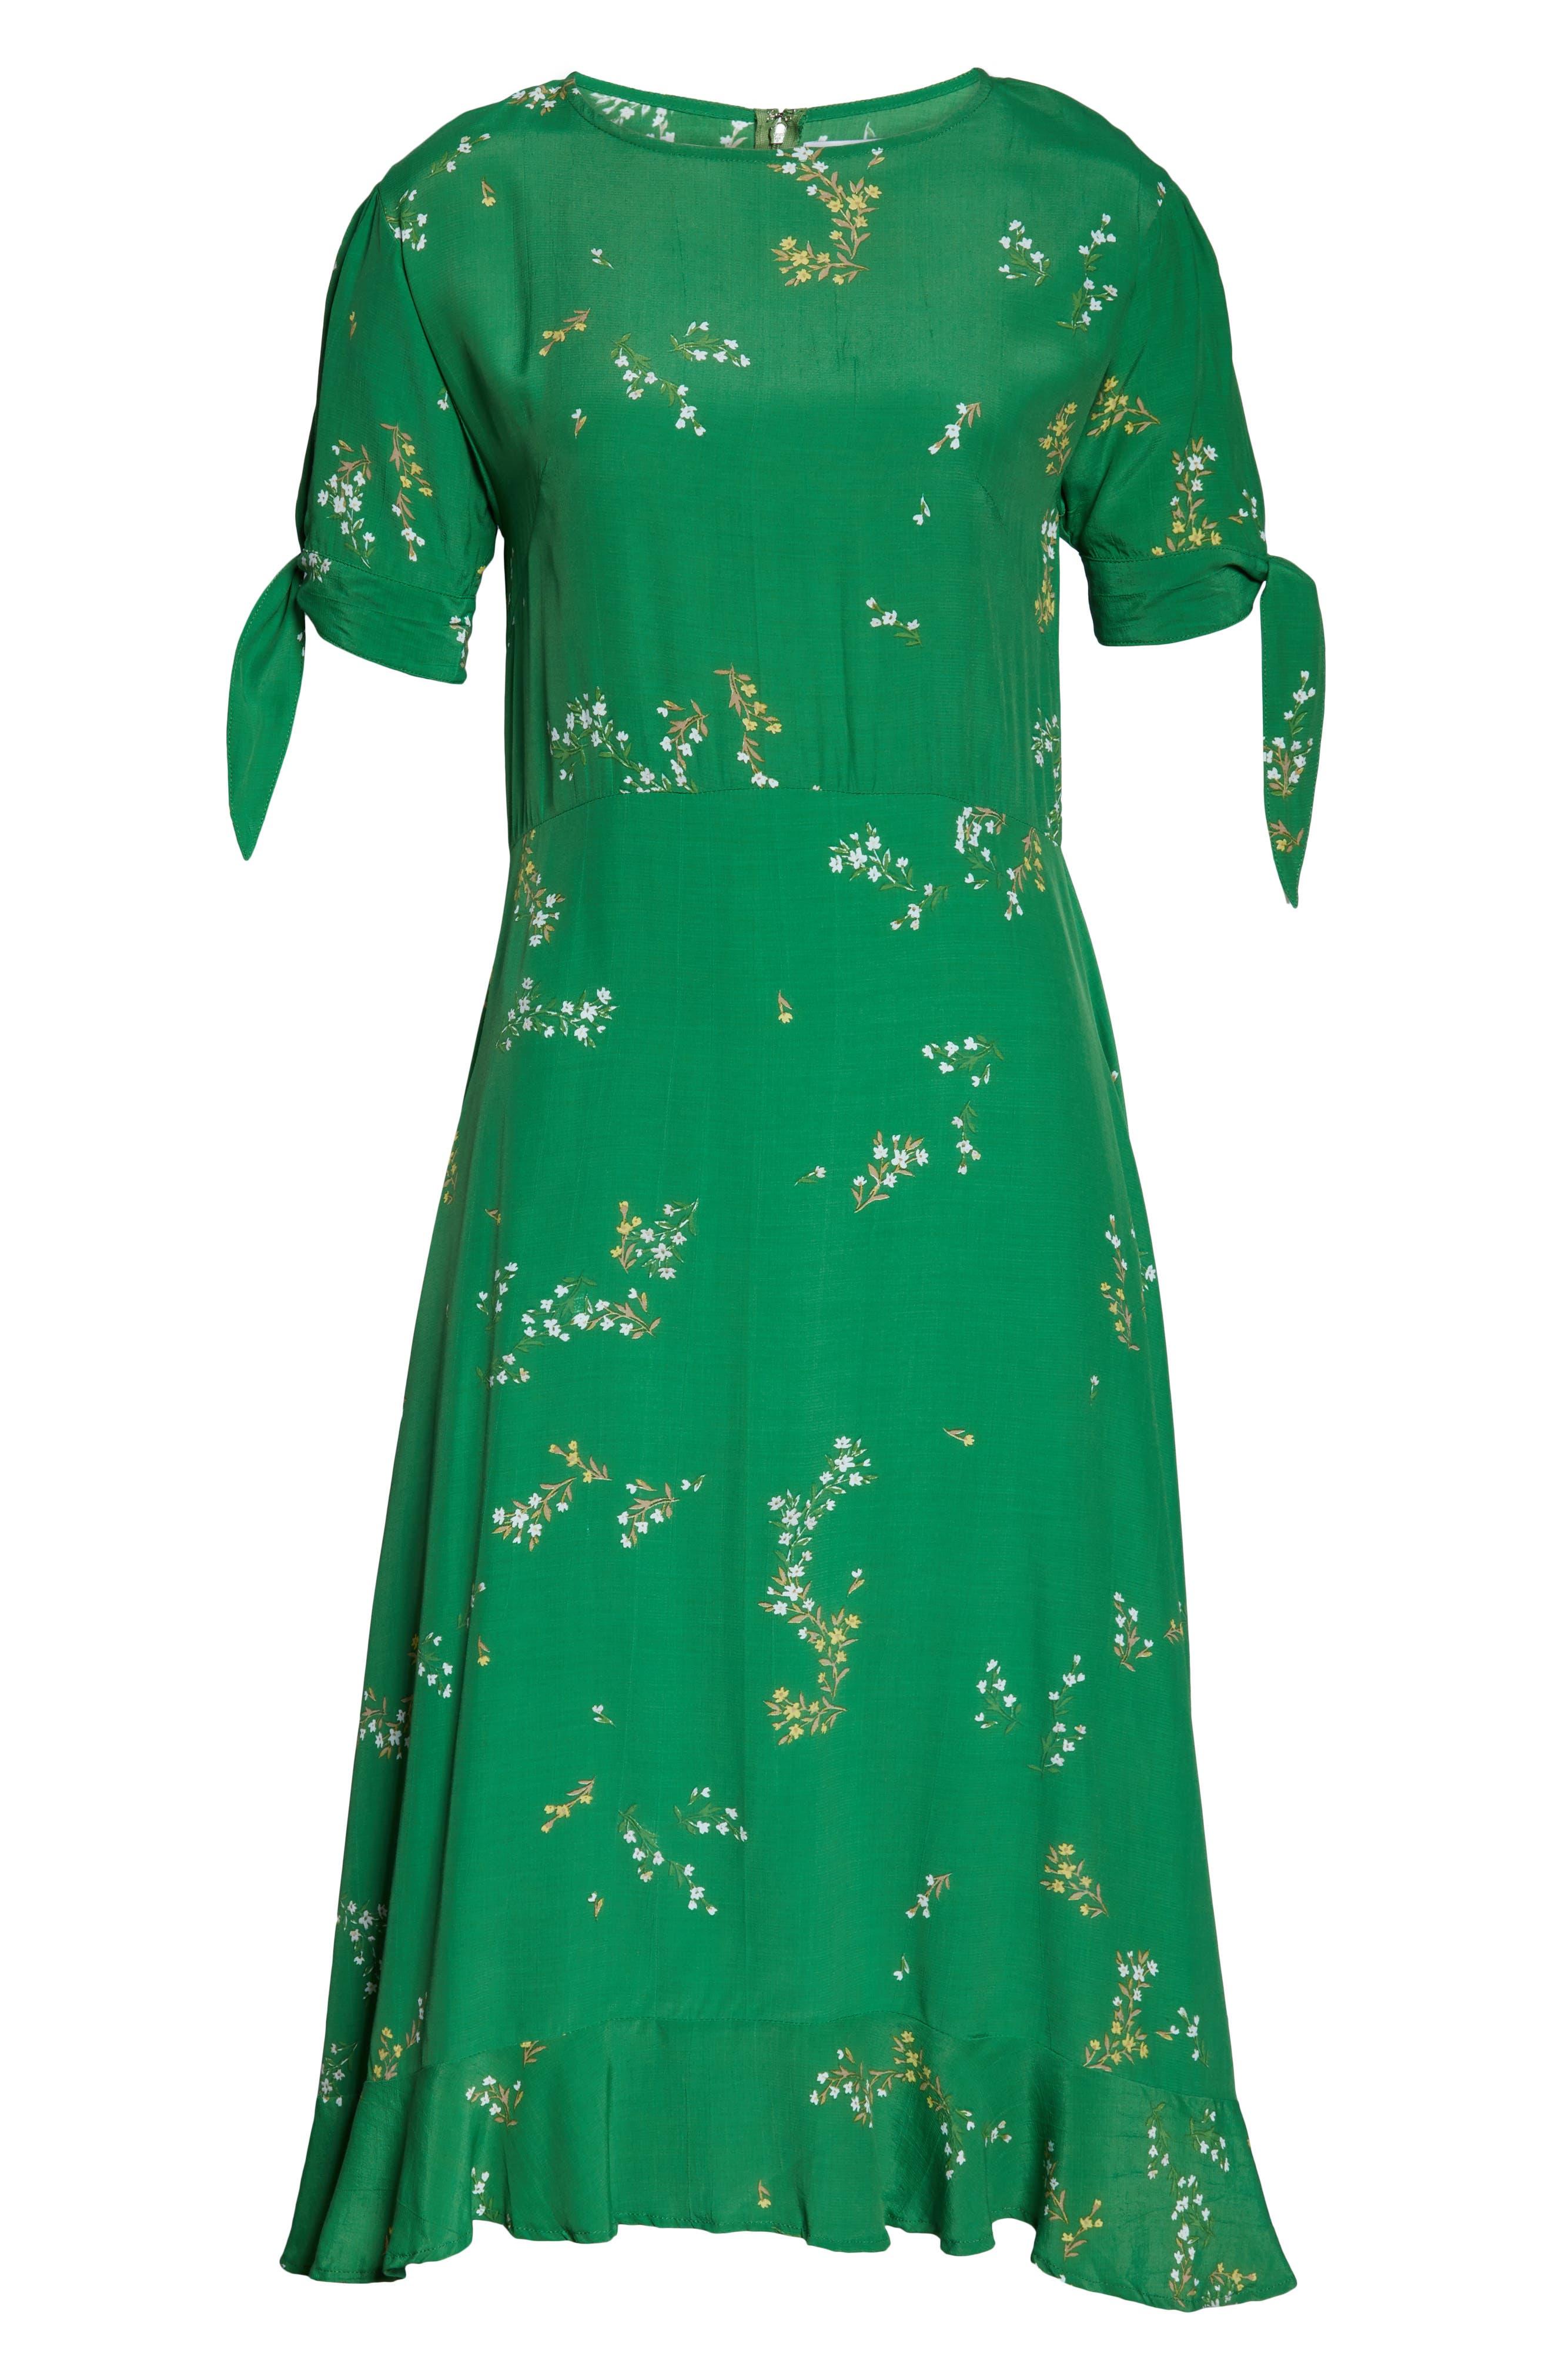 FAITHFULL THE BRAND, Emilia Floral Midi Dress, Alternate thumbnail 5, color, MYRTILLE FLORAL PRINT - GREEN